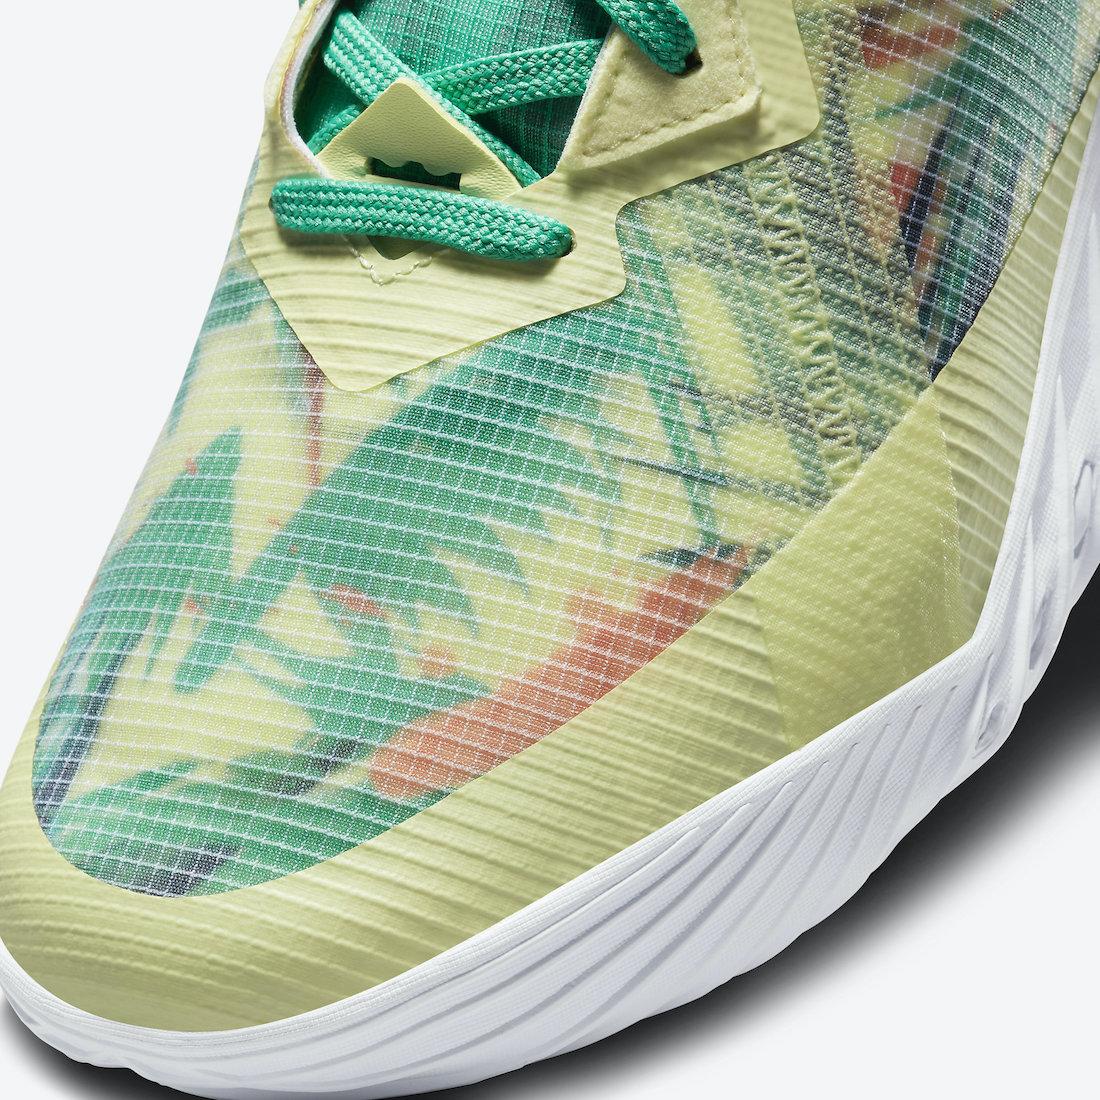 Nike-LeBron-18-Low-LeBronold-Palmer-CV7562-300-Release-Date-6